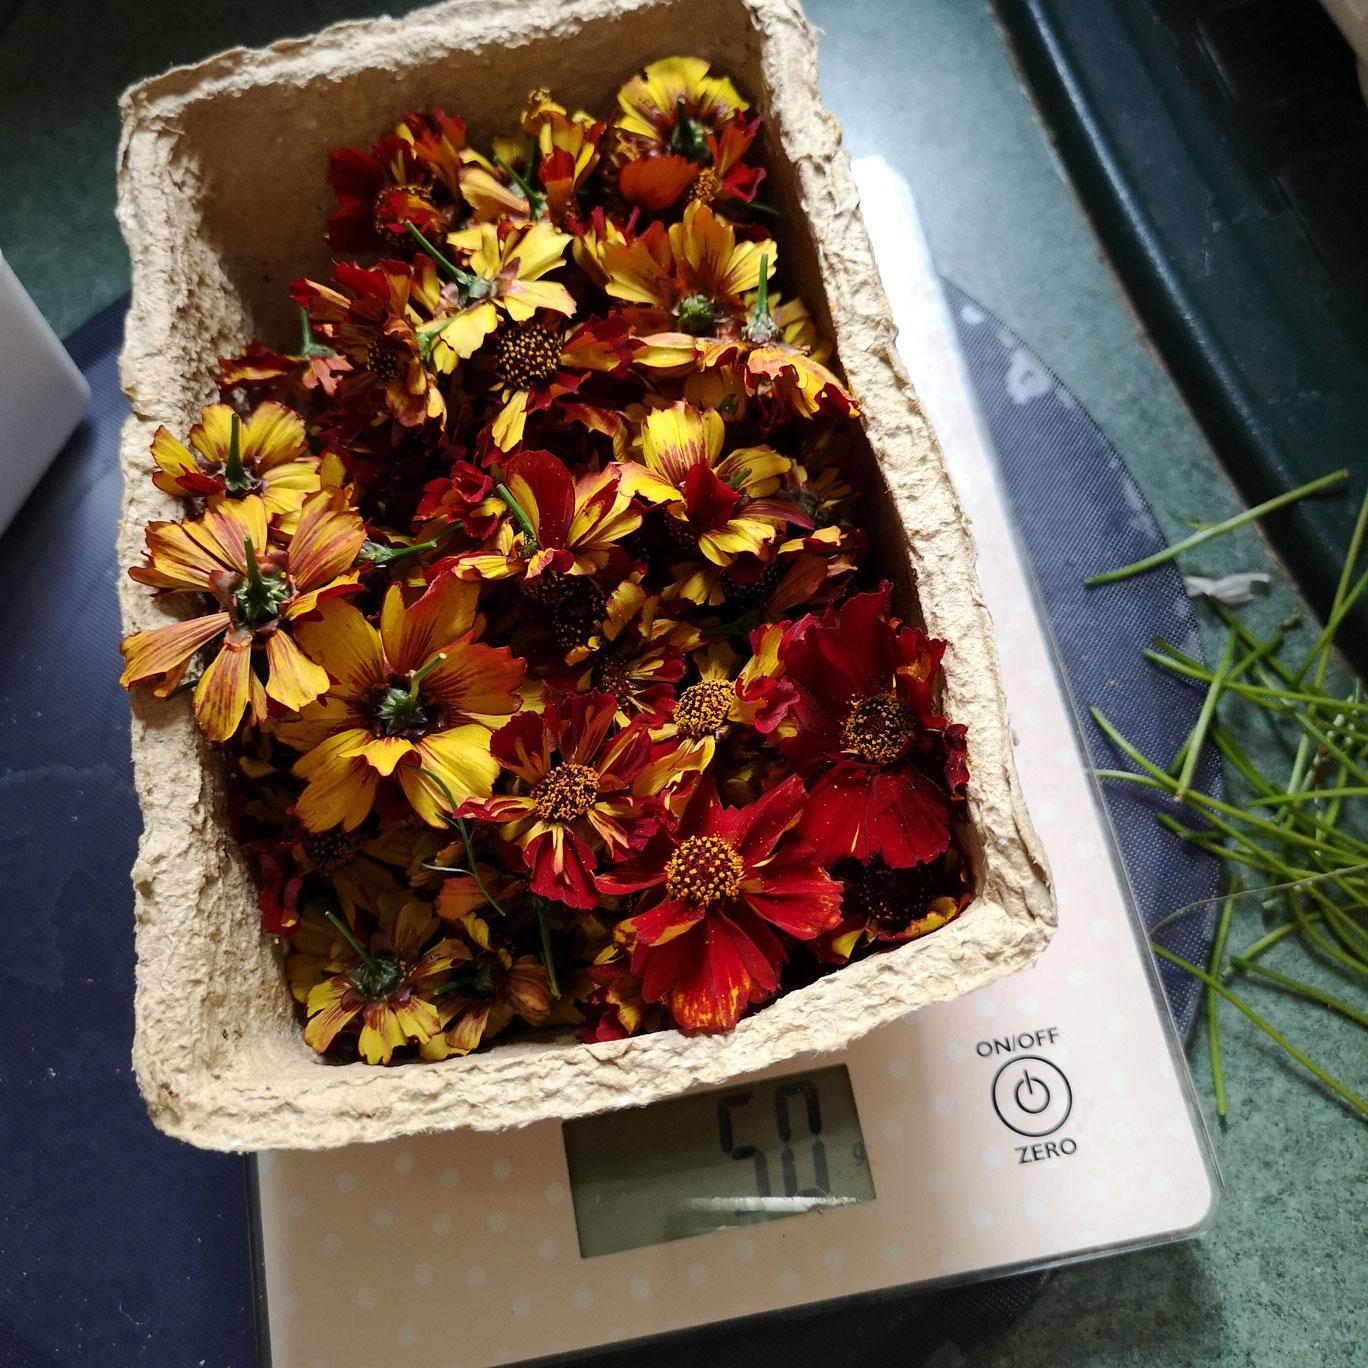 ria-burns-knitwear-coreopsis-tinctoria-roulette-flower-dye-2.jpg